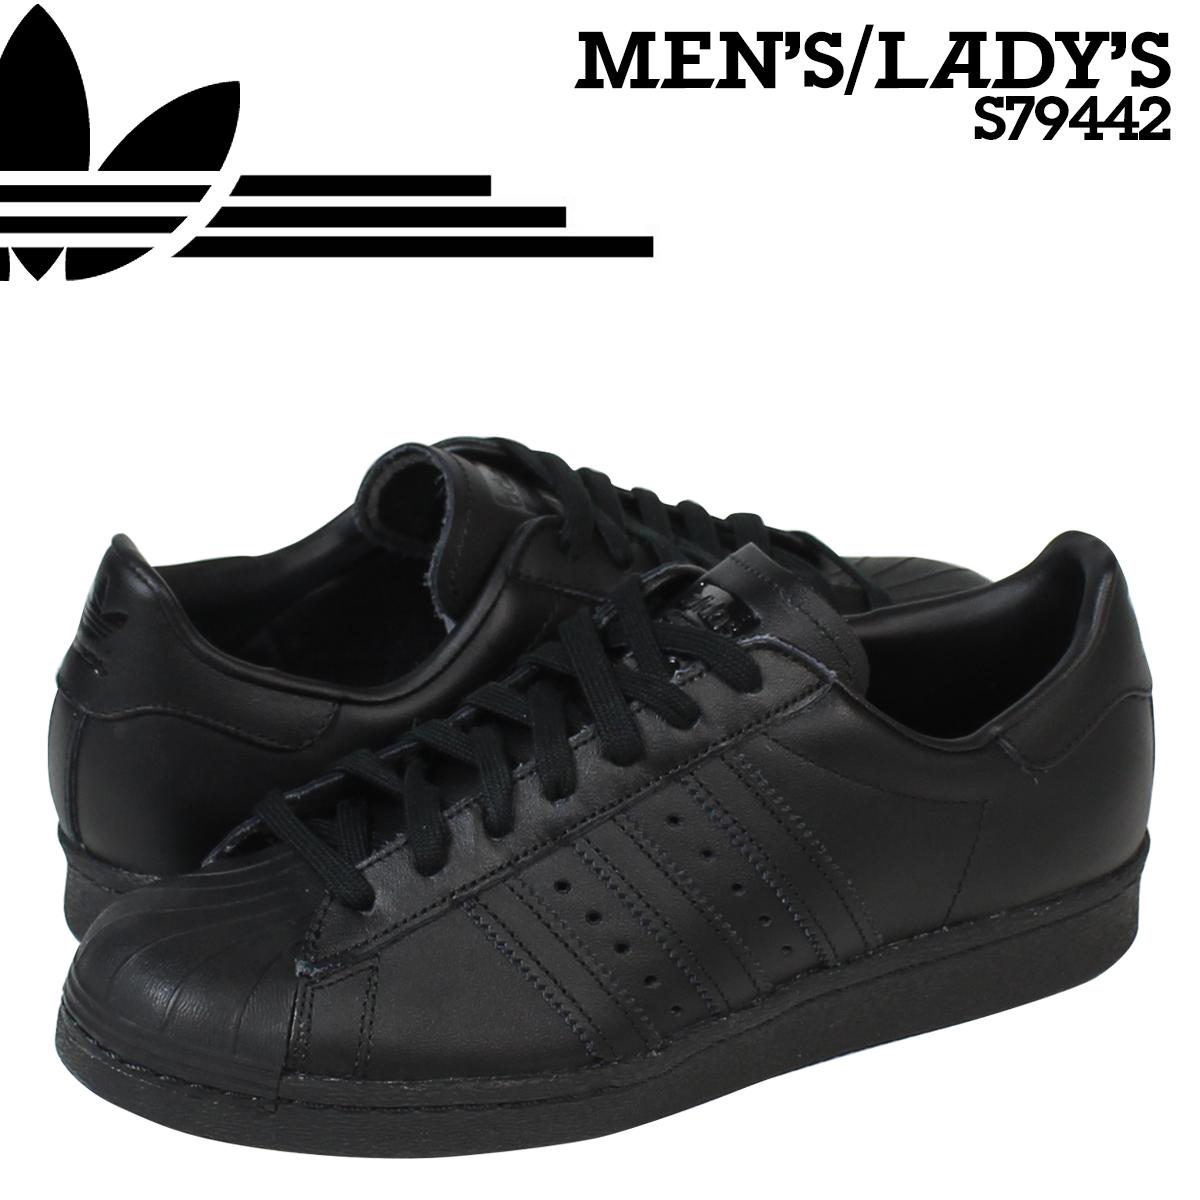 Adidas originals adidas Originals superstar triple TNA sneakers SUPERSTAR  80 s TRIPLE TONA S79442 men\u0027s women\u0027s